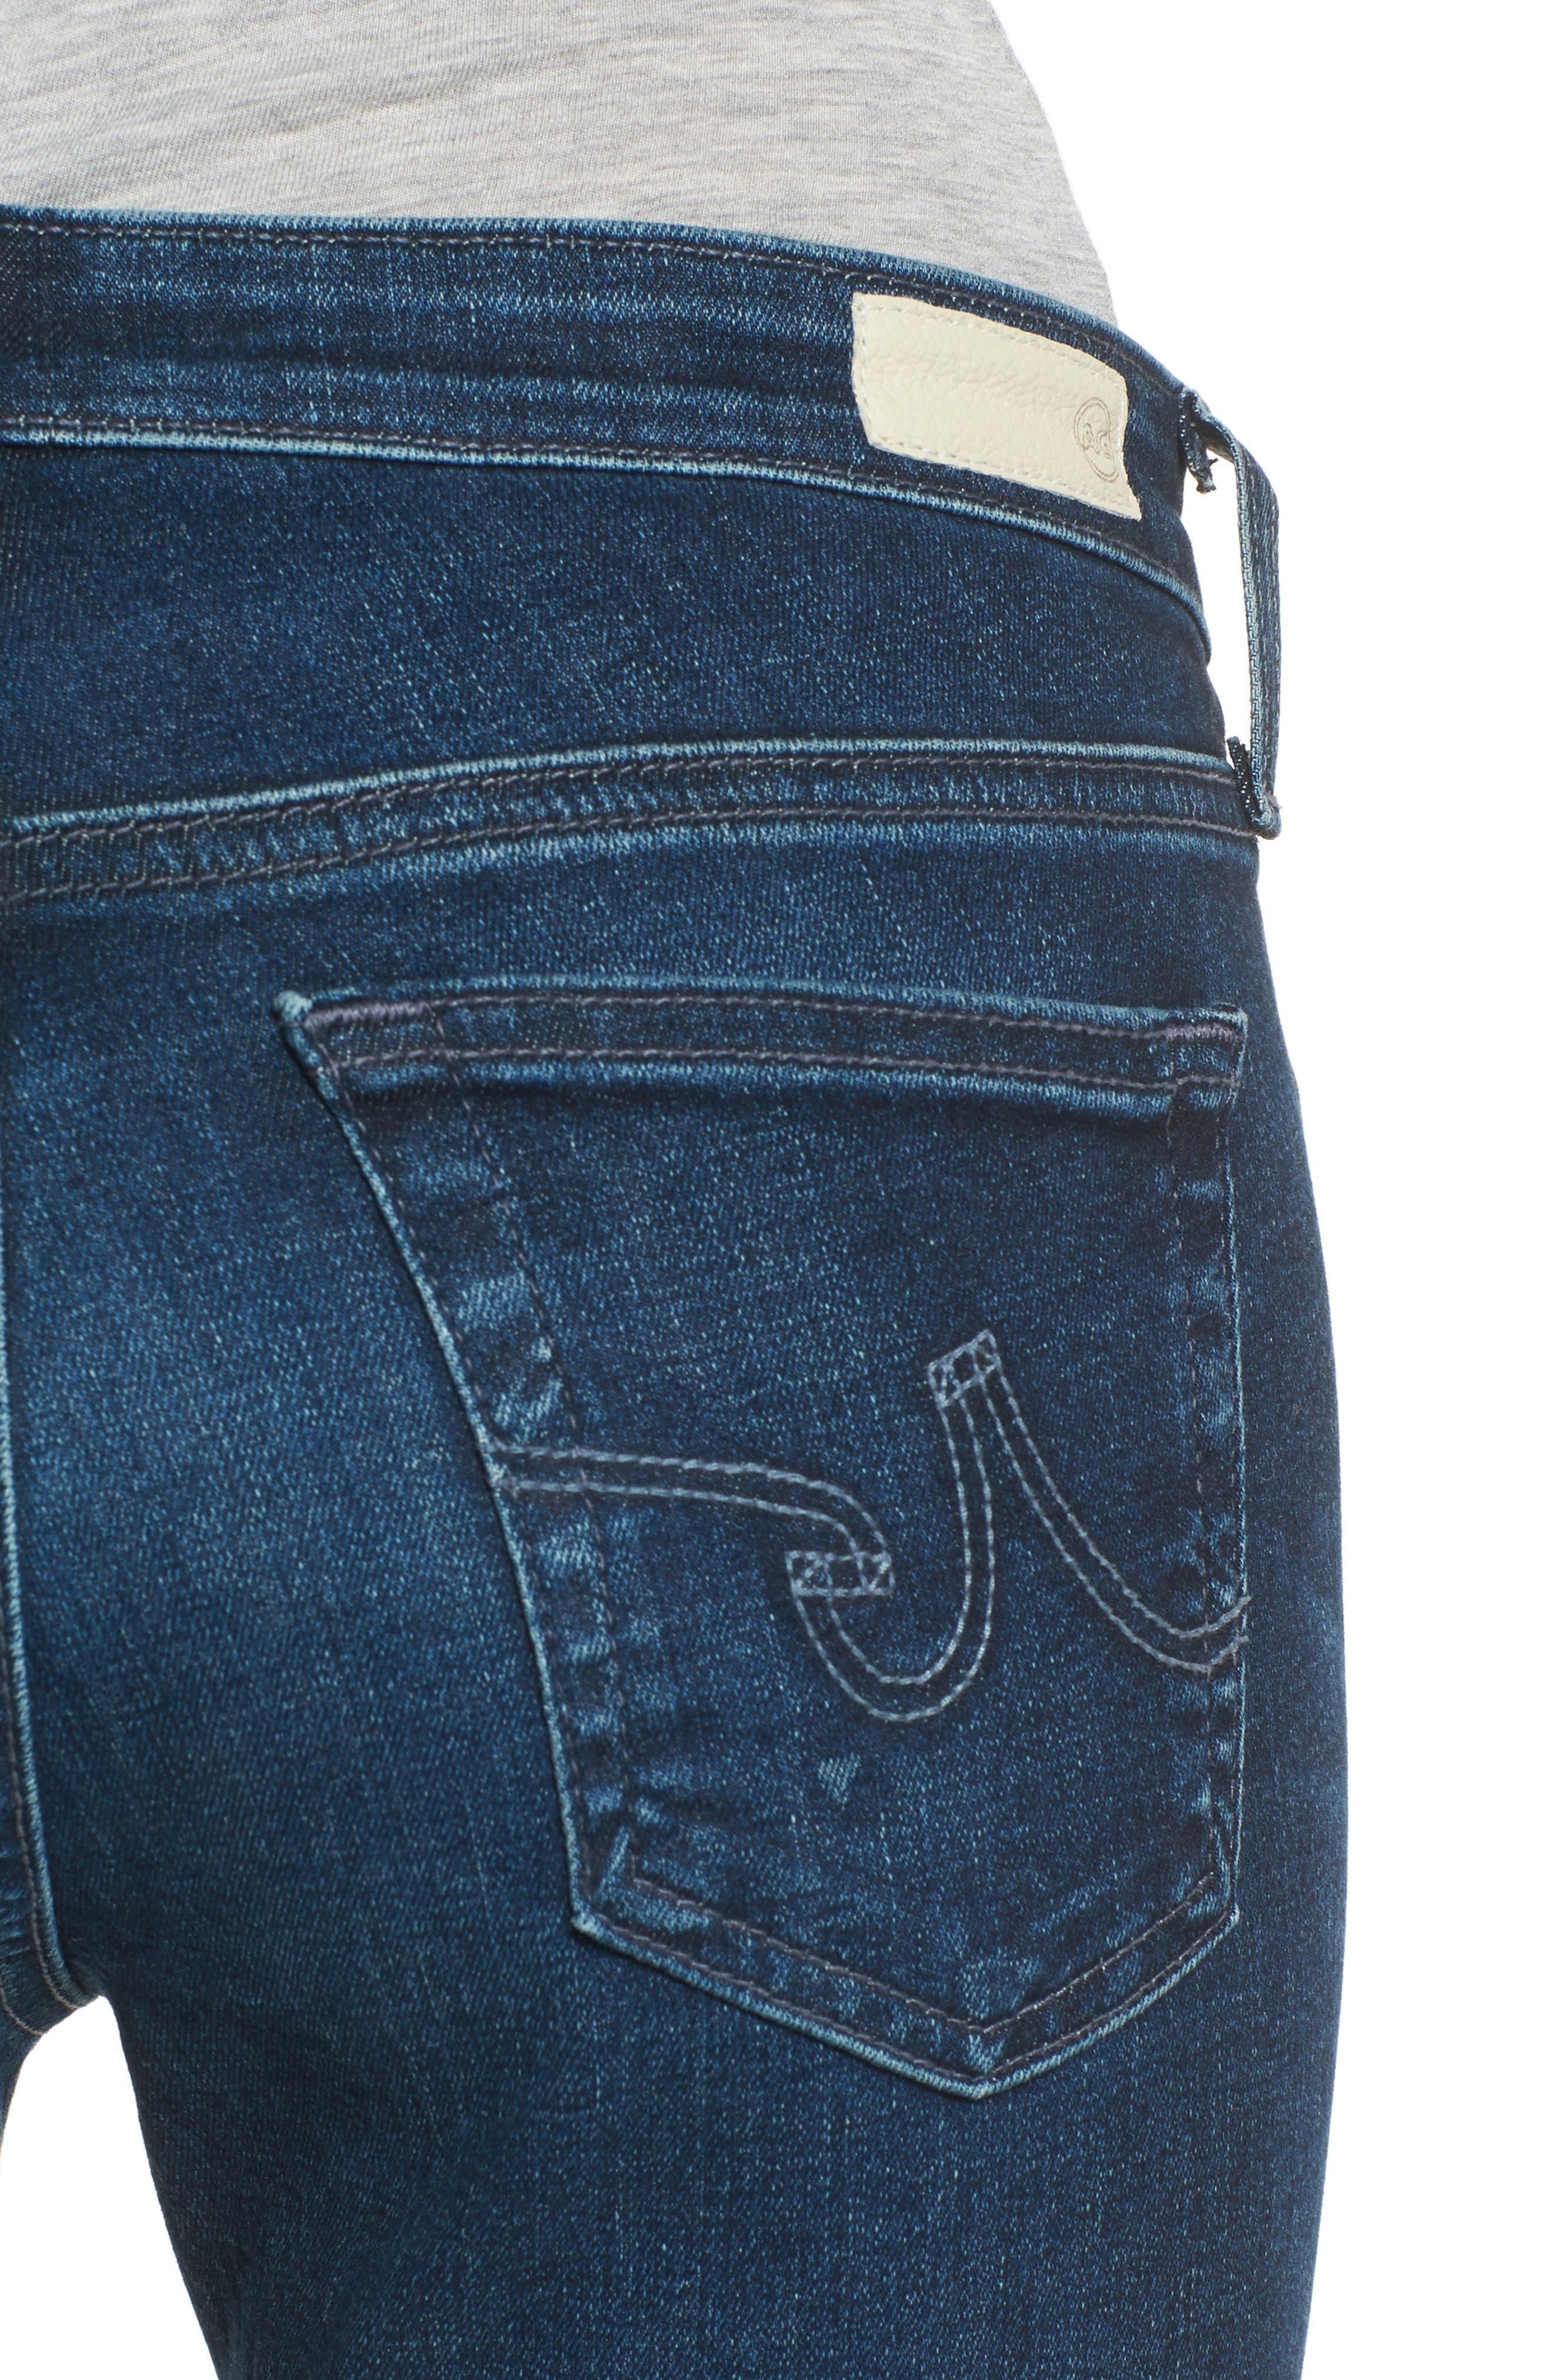 Alternate Image 4  - AG The Legging Ankle Super Skinny Jeans (04 Years Rapid)